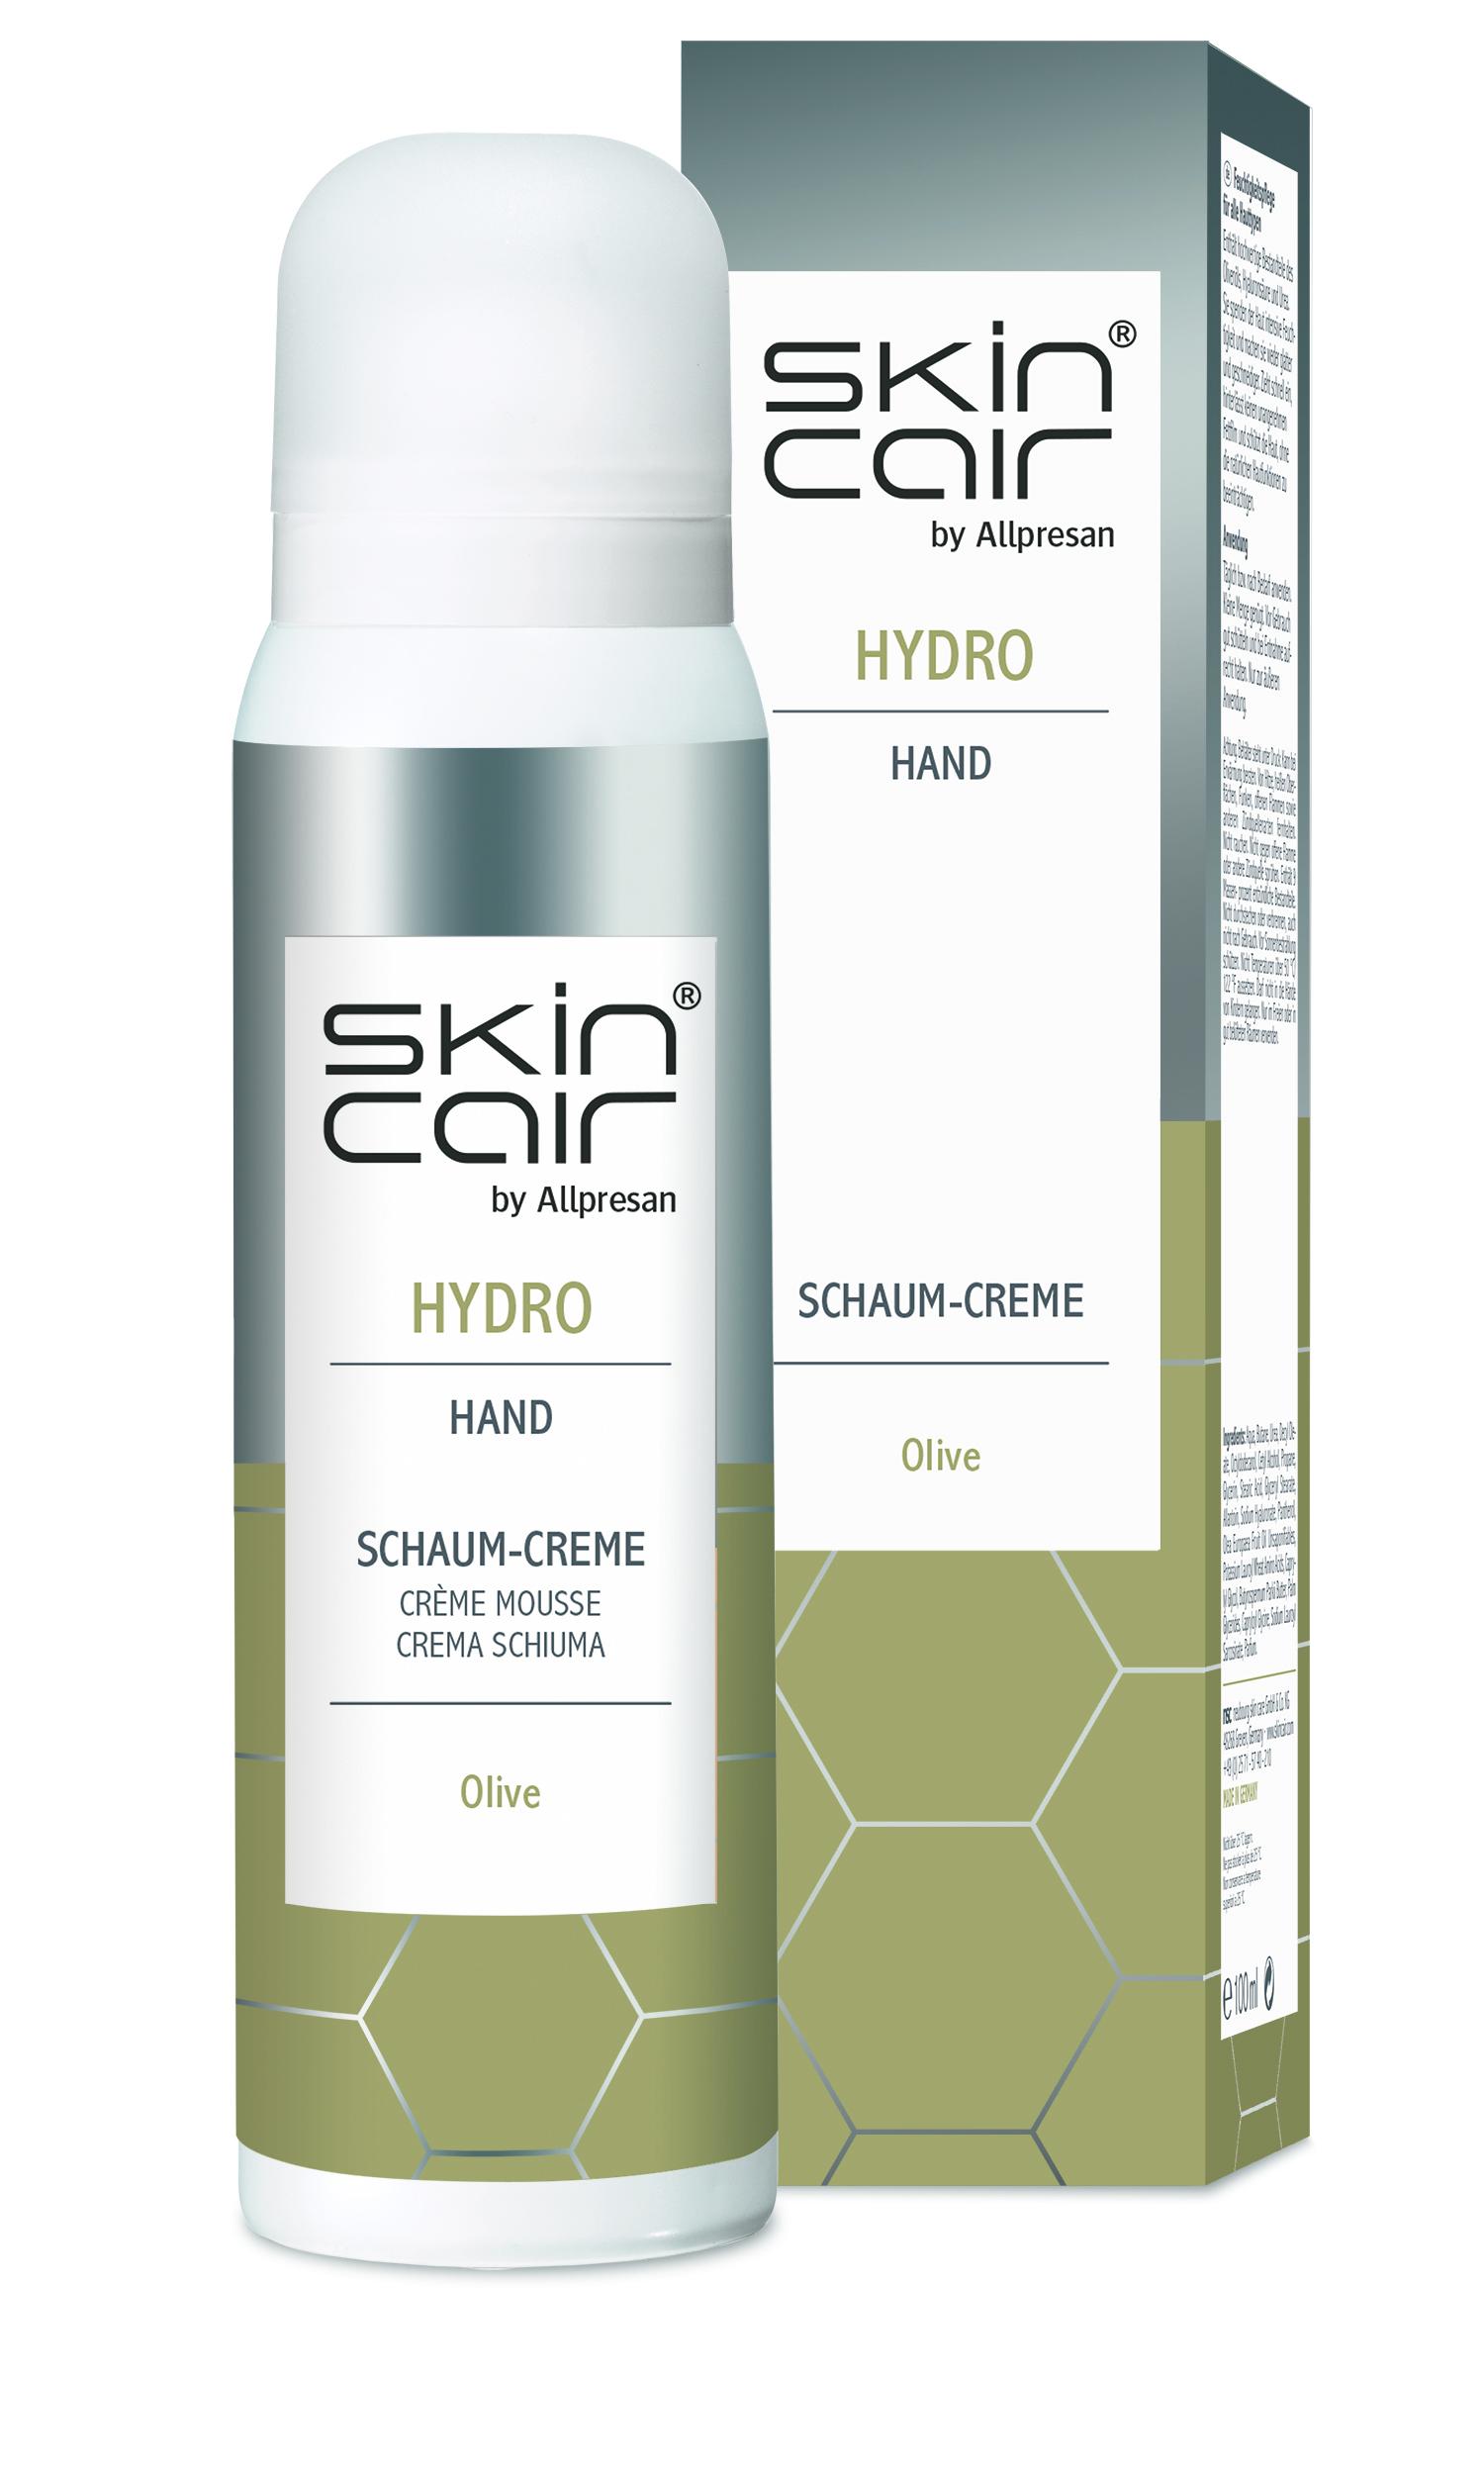 Skincair HYDRO Schaum-Creme Hand - 100 ml